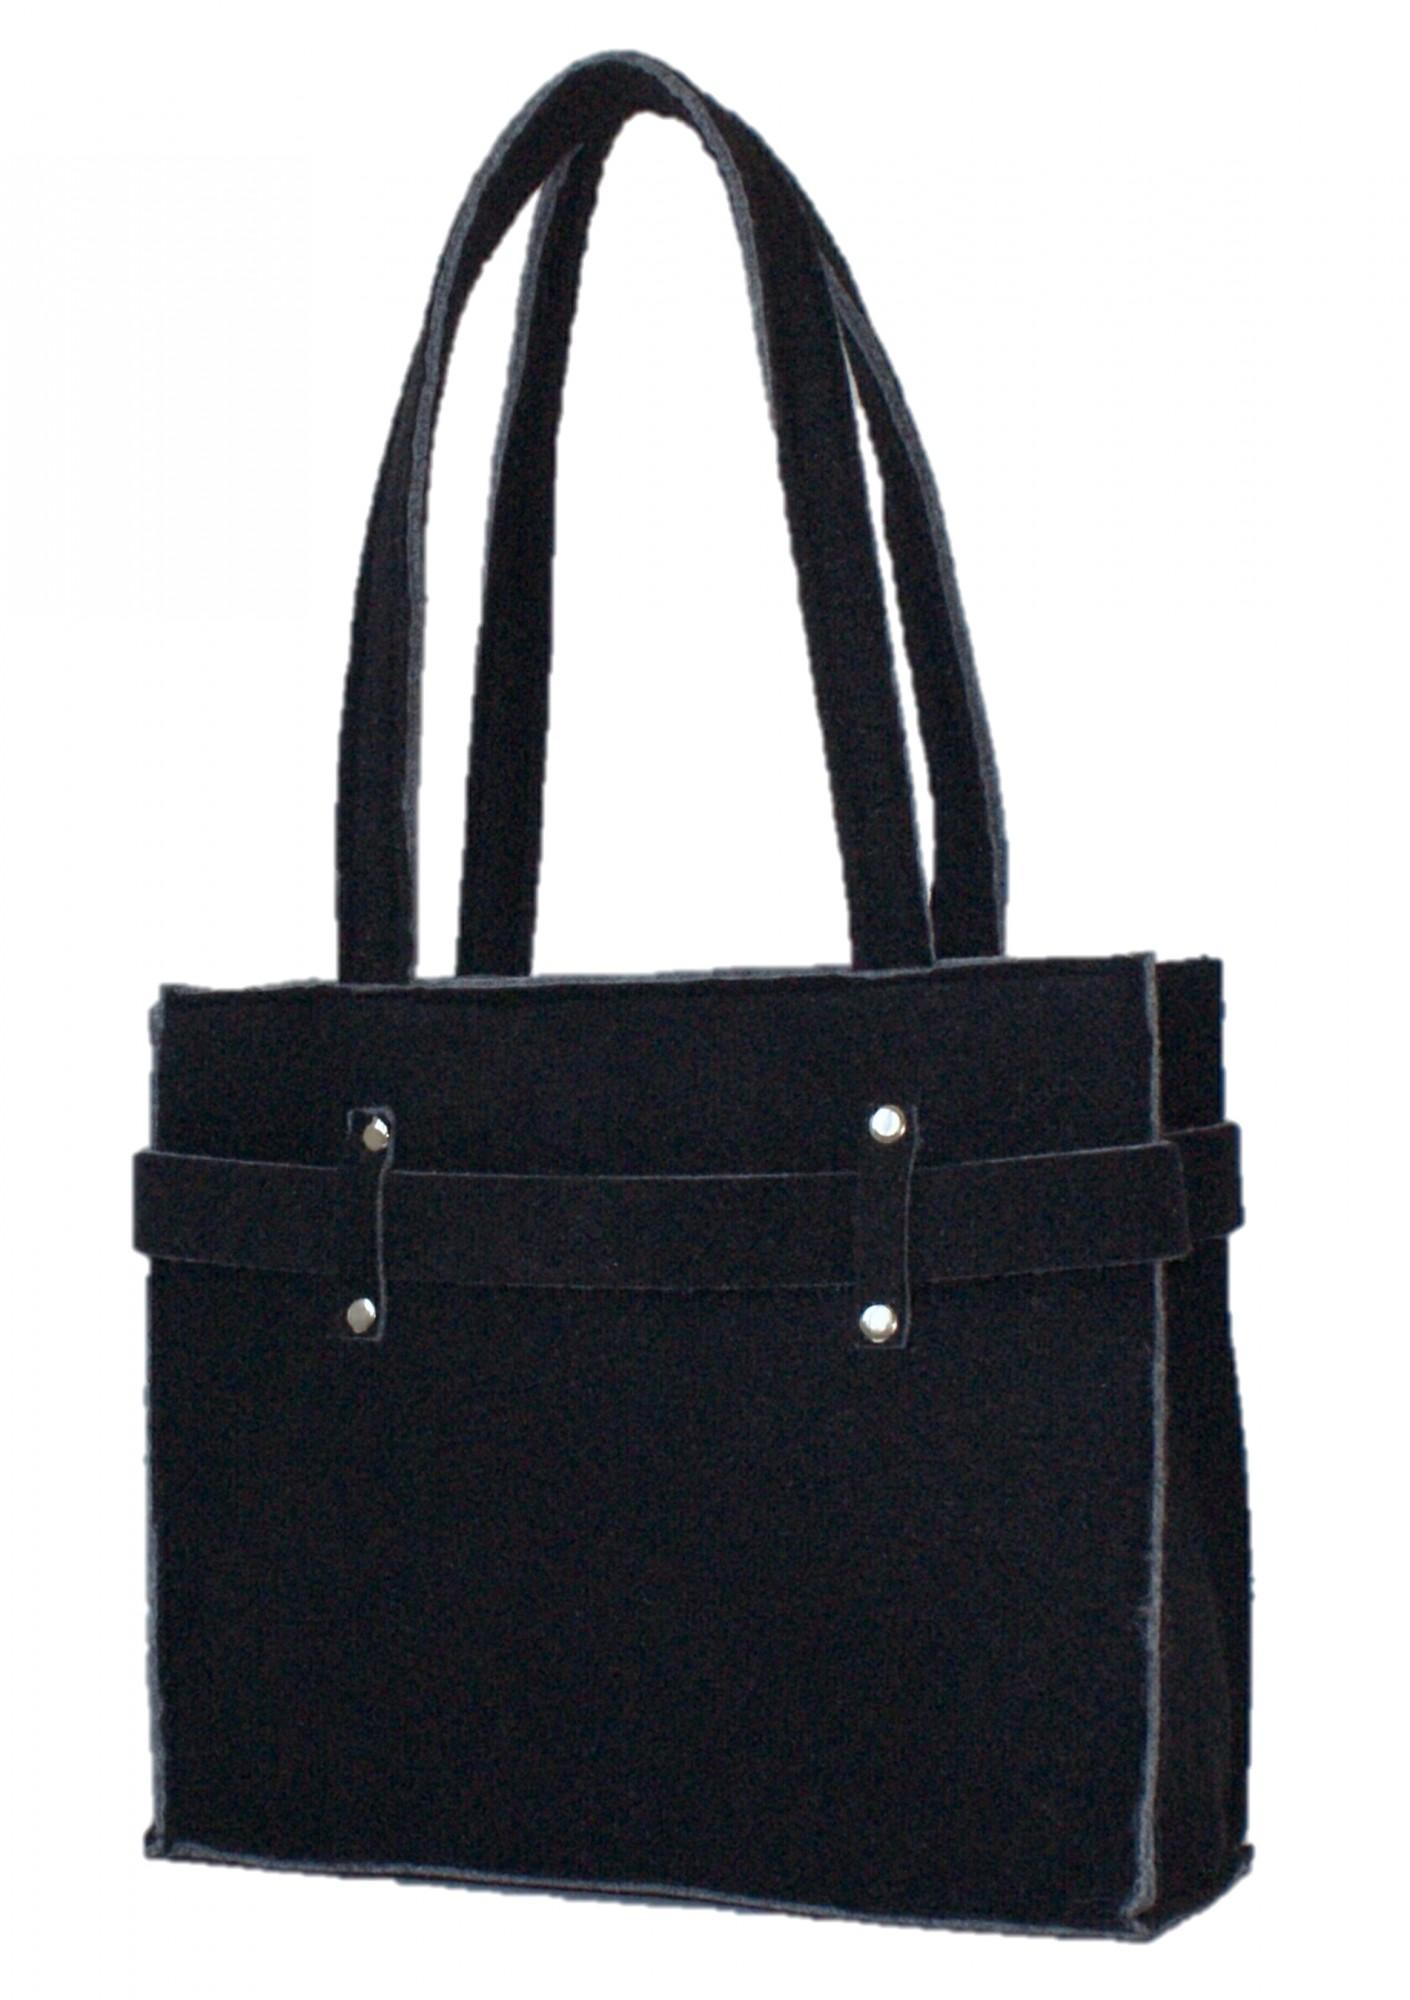 trachtentasche filz tasche filztasche shoppertasche. Black Bedroom Furniture Sets. Home Design Ideas